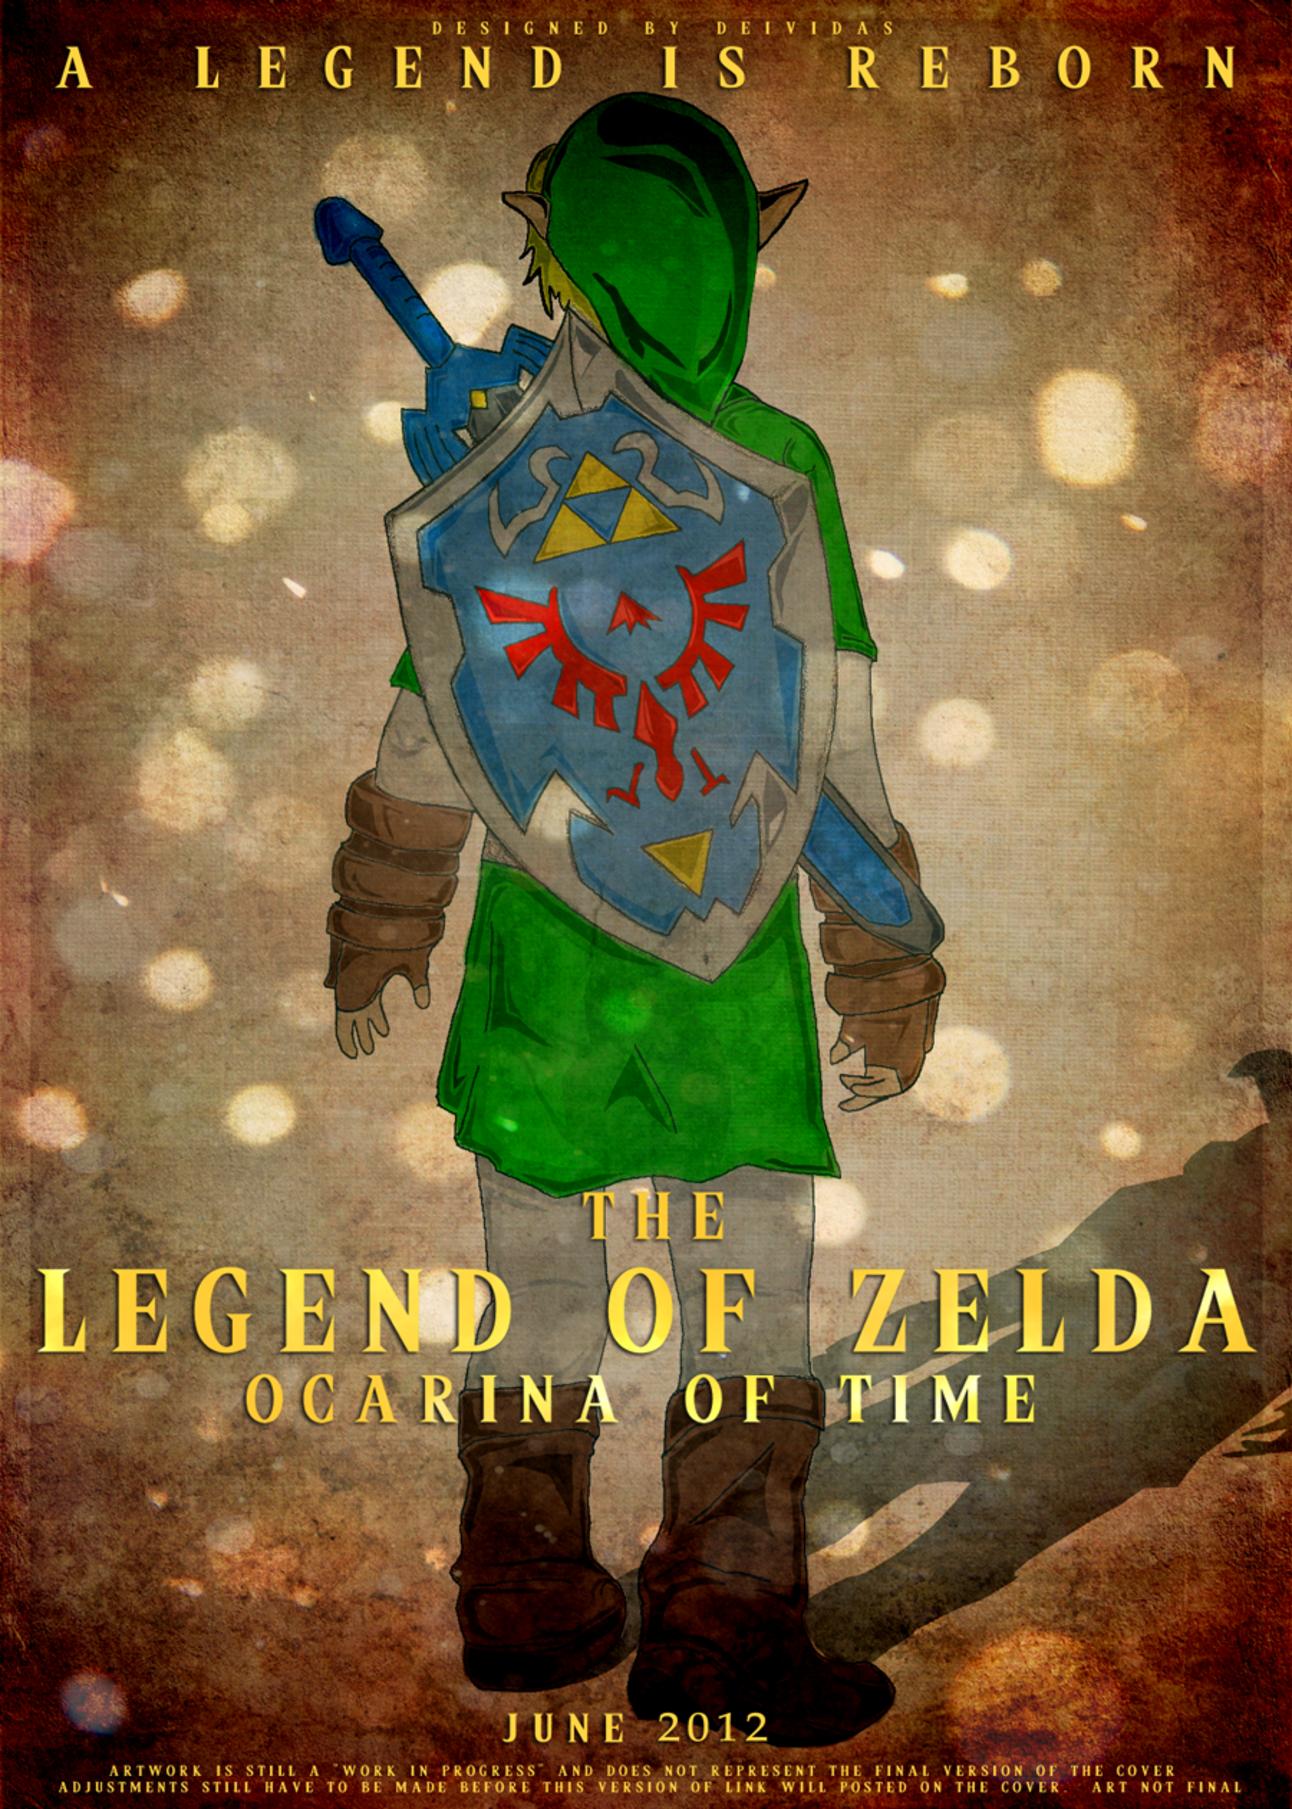 legend_of_zelda_ocarina_of_time_character_poster_by_deividas12-d4x0uek.png